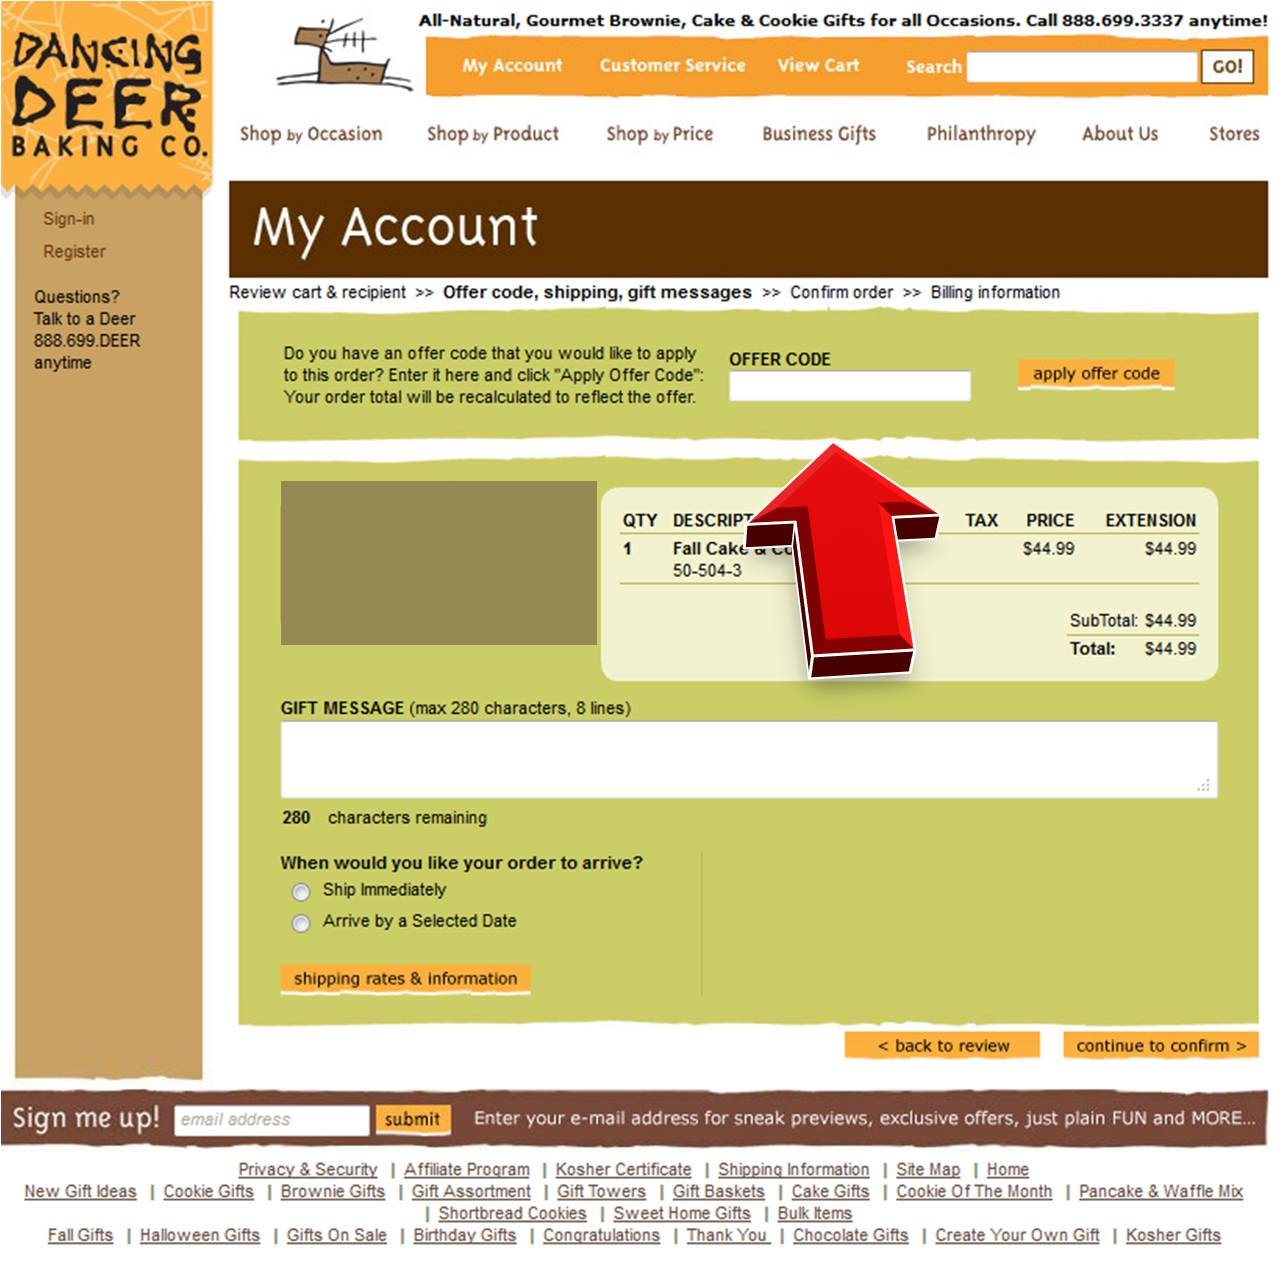 K deer coupon code